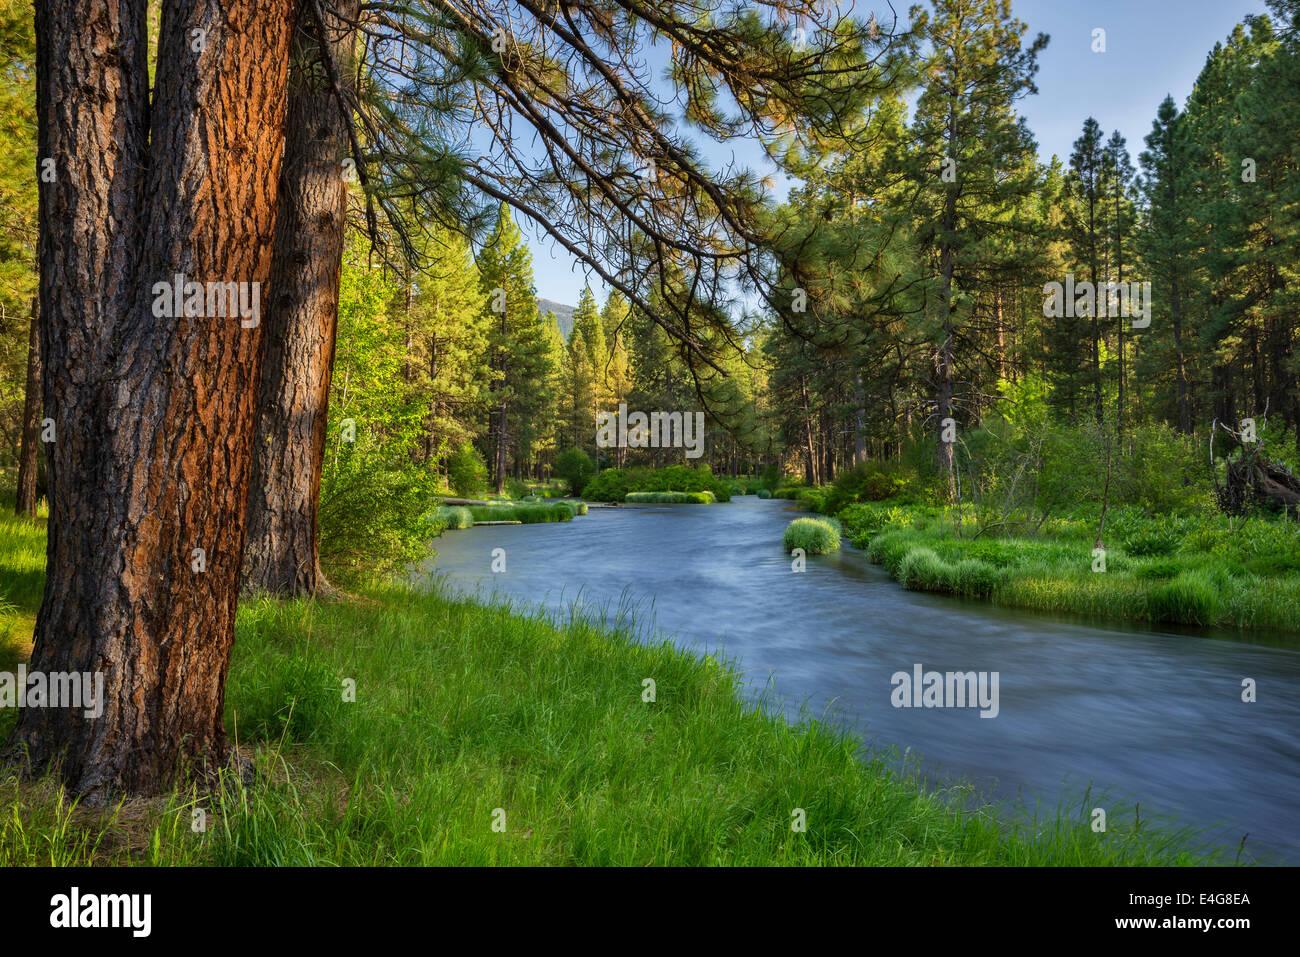 Metolius River, Deschutes National Forest, Central Oregon. - Stock Image